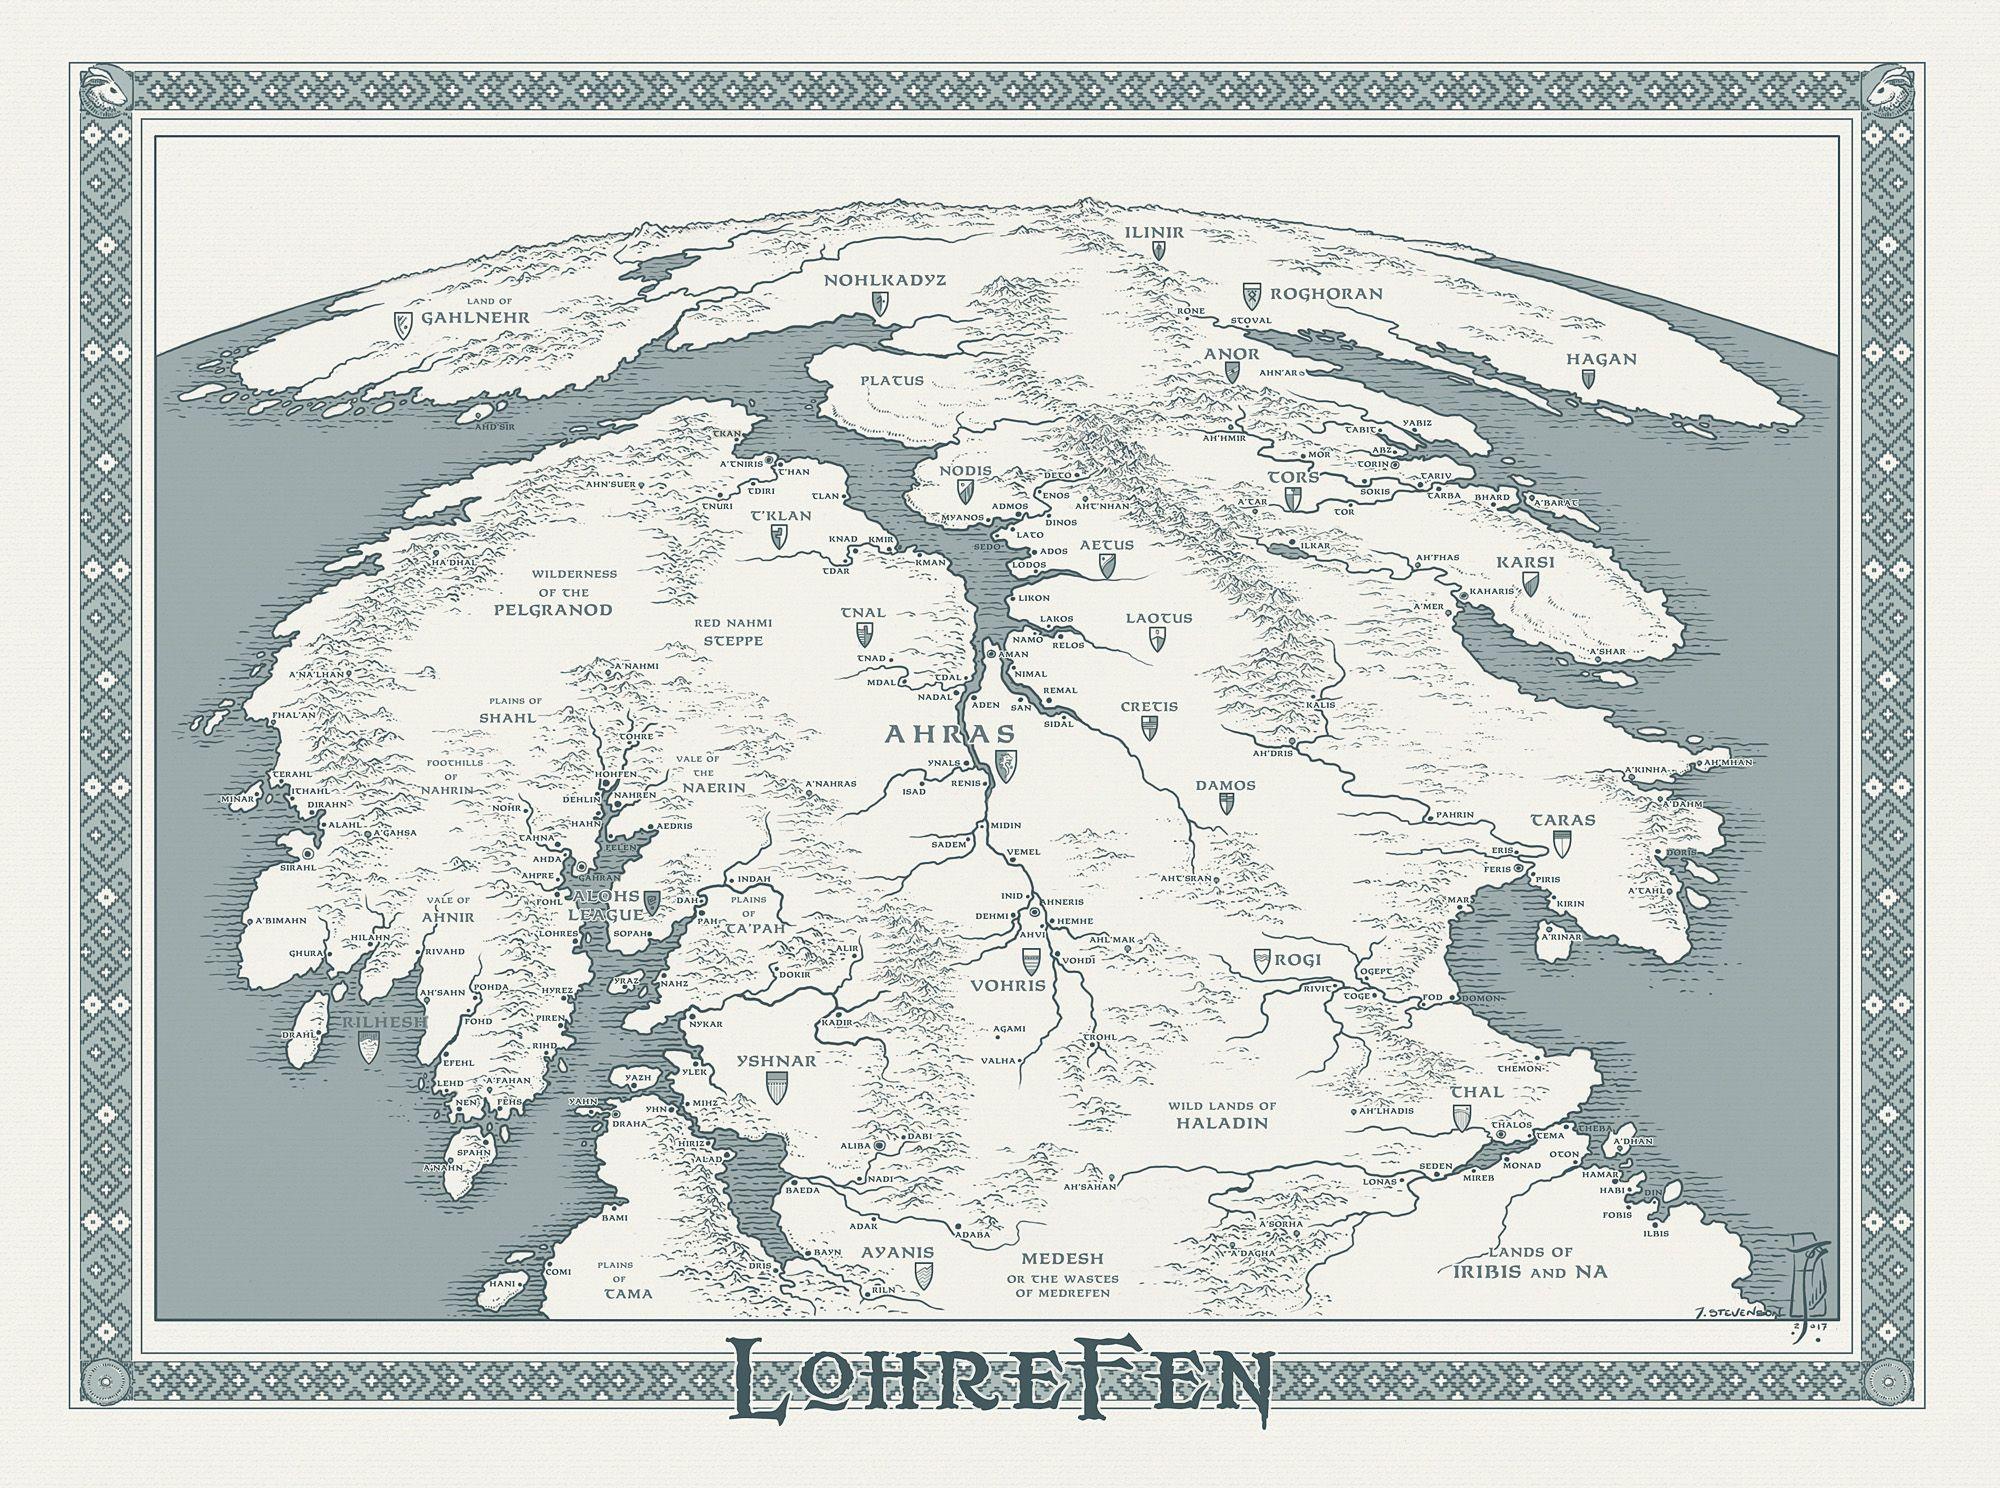 Lohrefen by sirinkman 技術 pinterest fantasy map and sketches